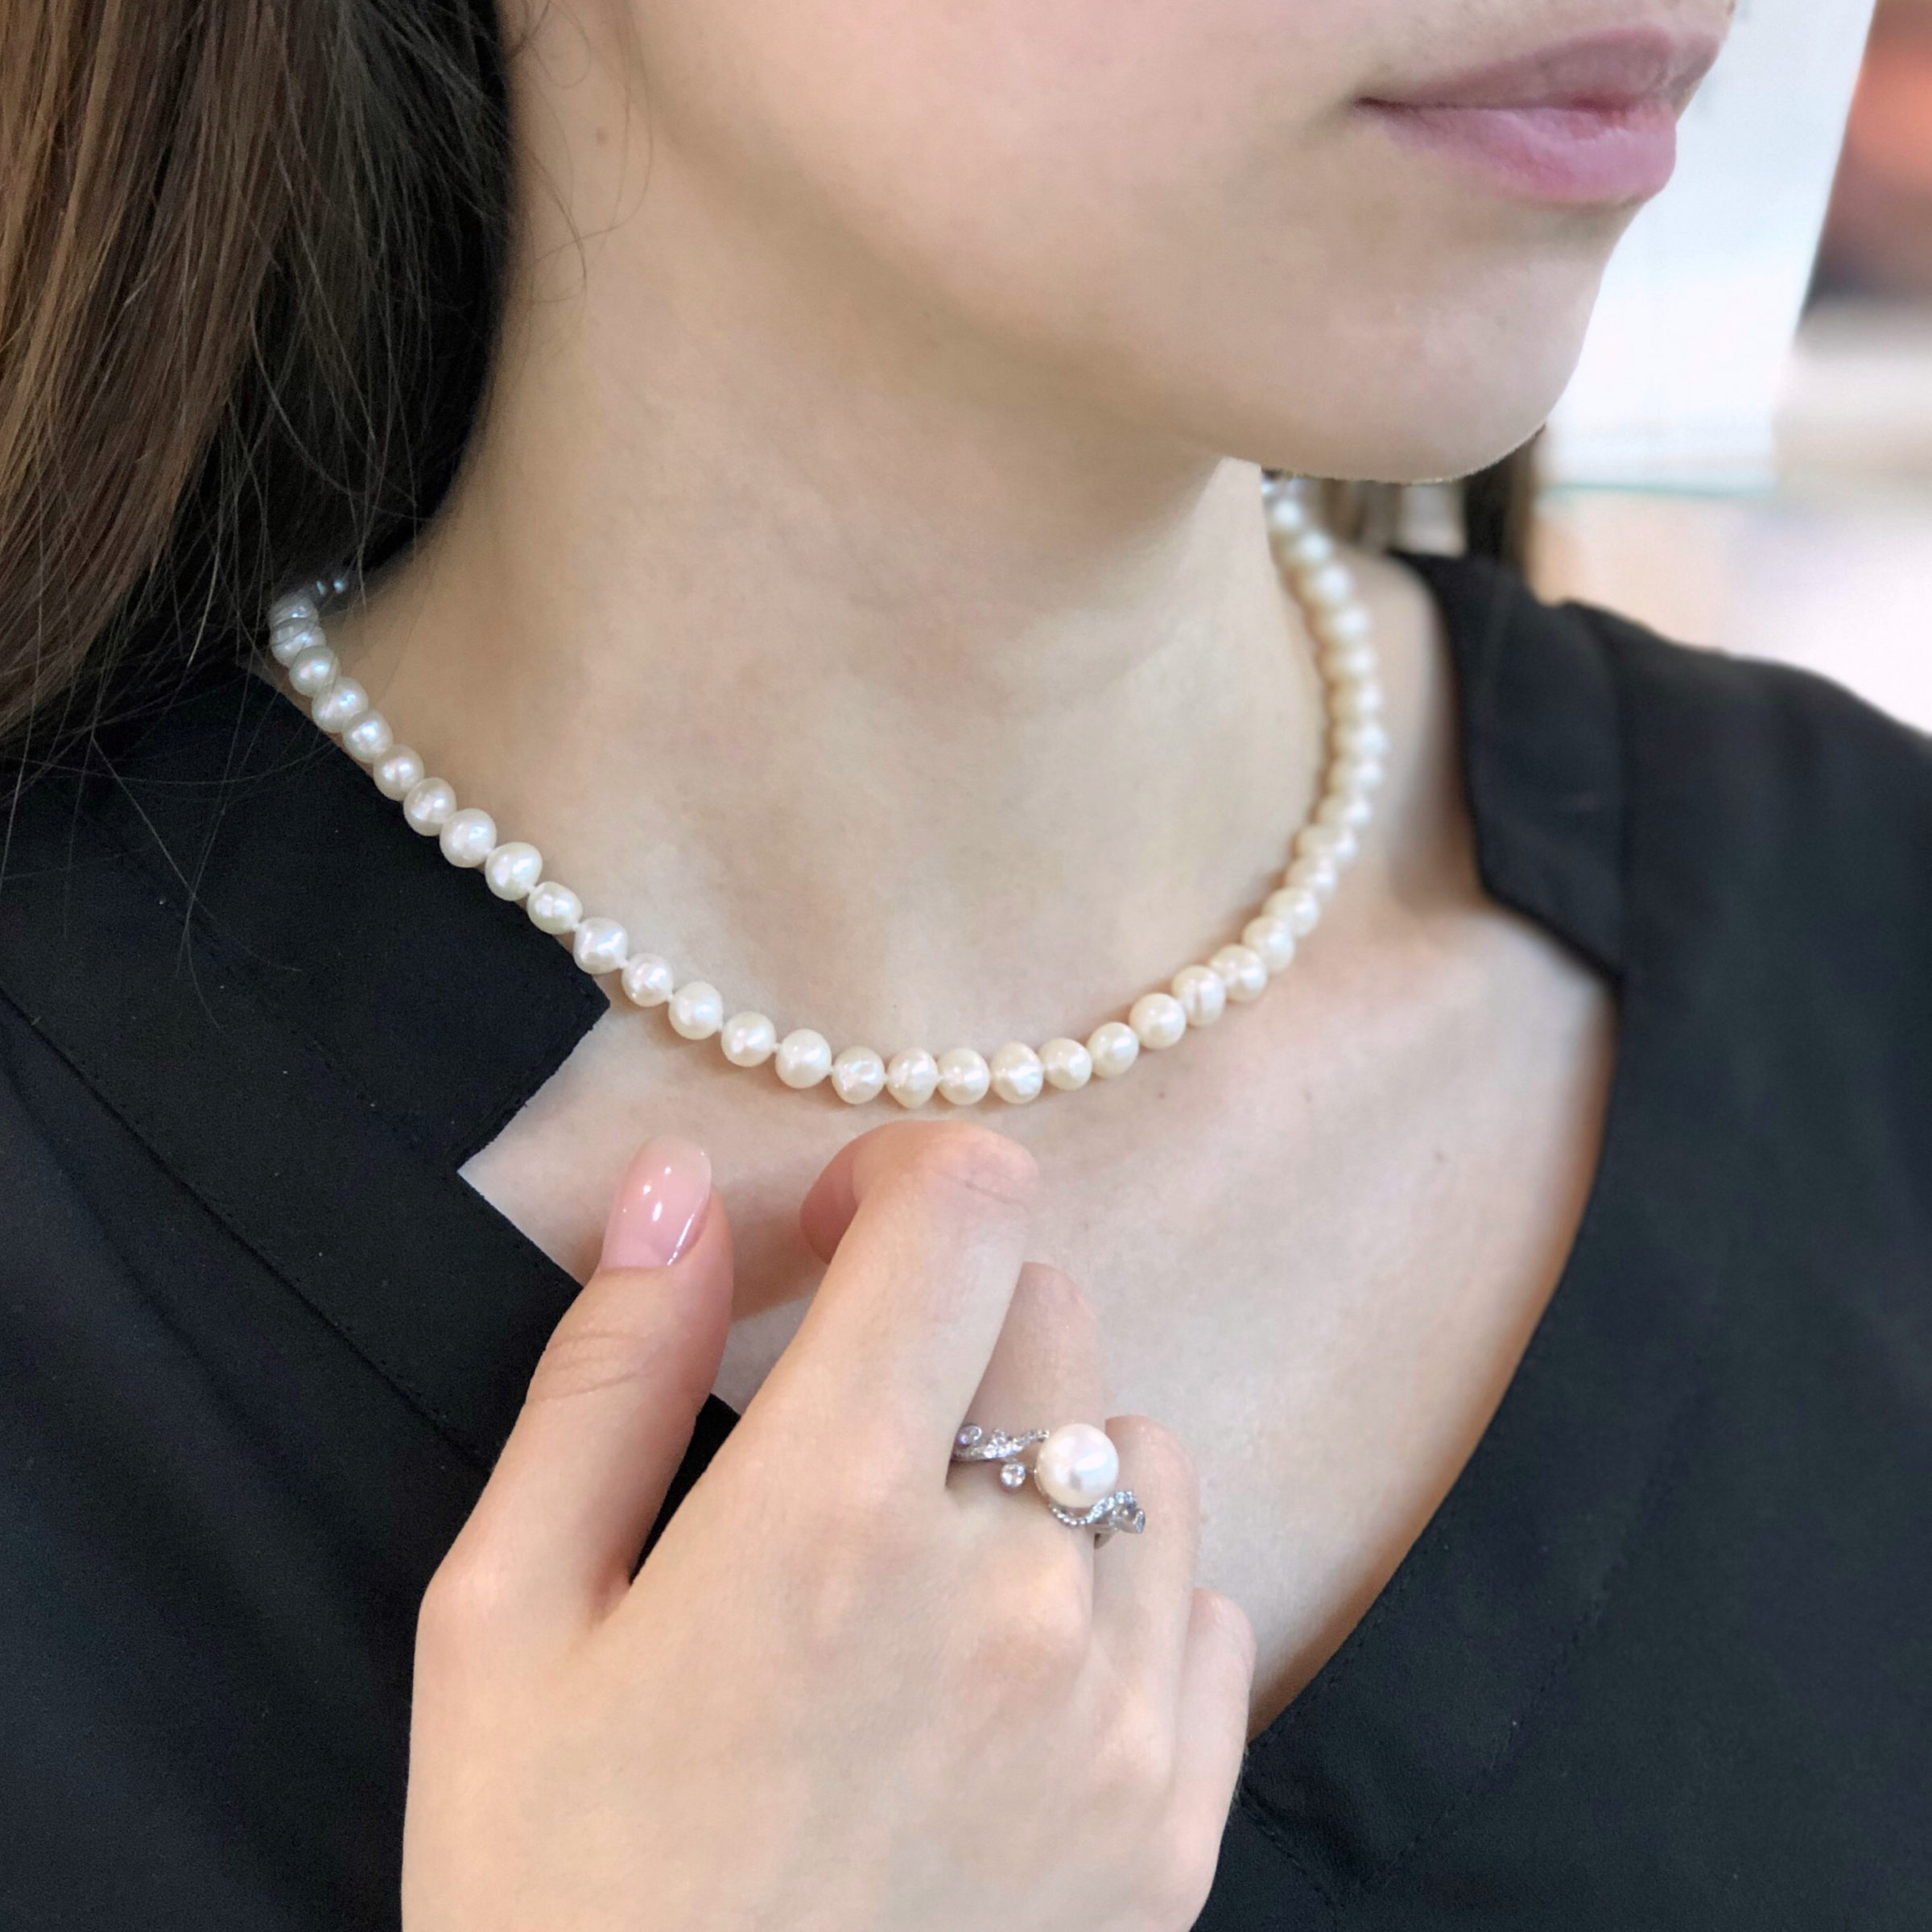 jewelry on the girl HXG2YNP